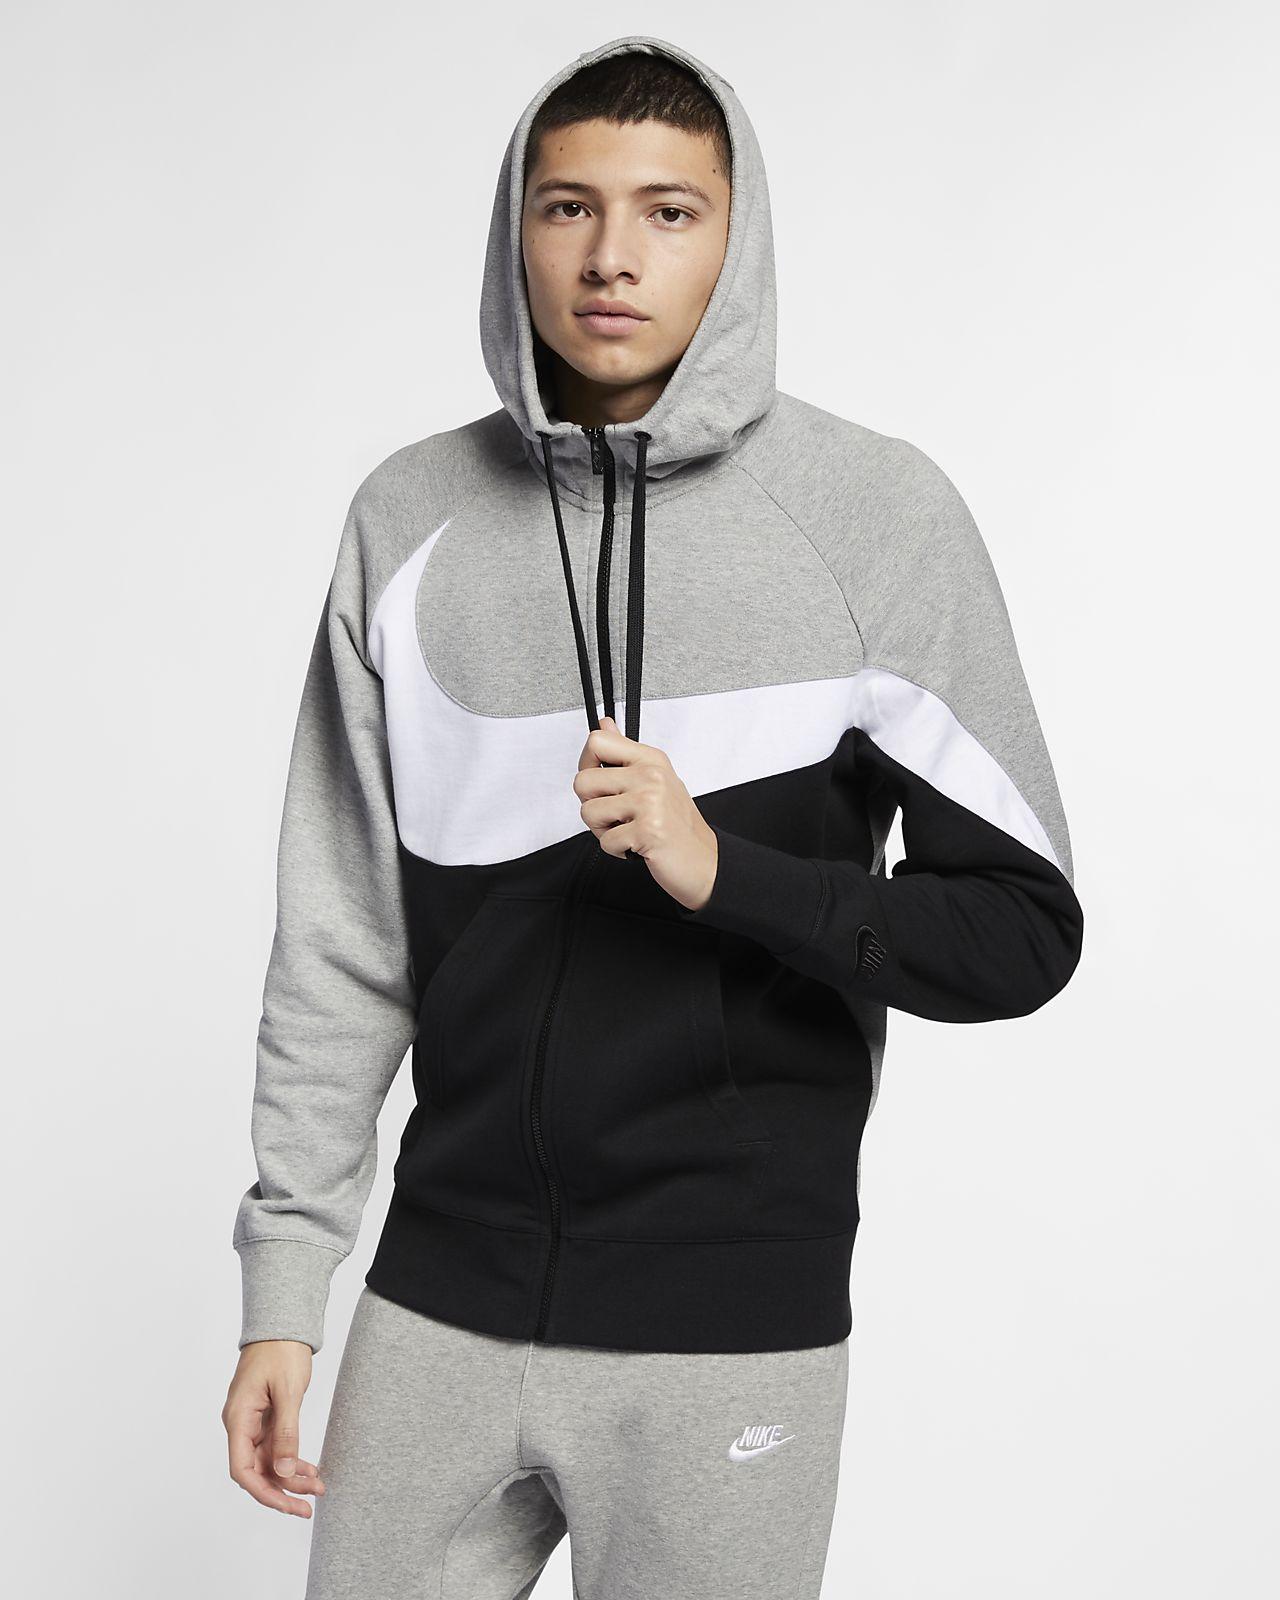 Nike Sportswear French Terry 男子全长拉链开襟连帽衫